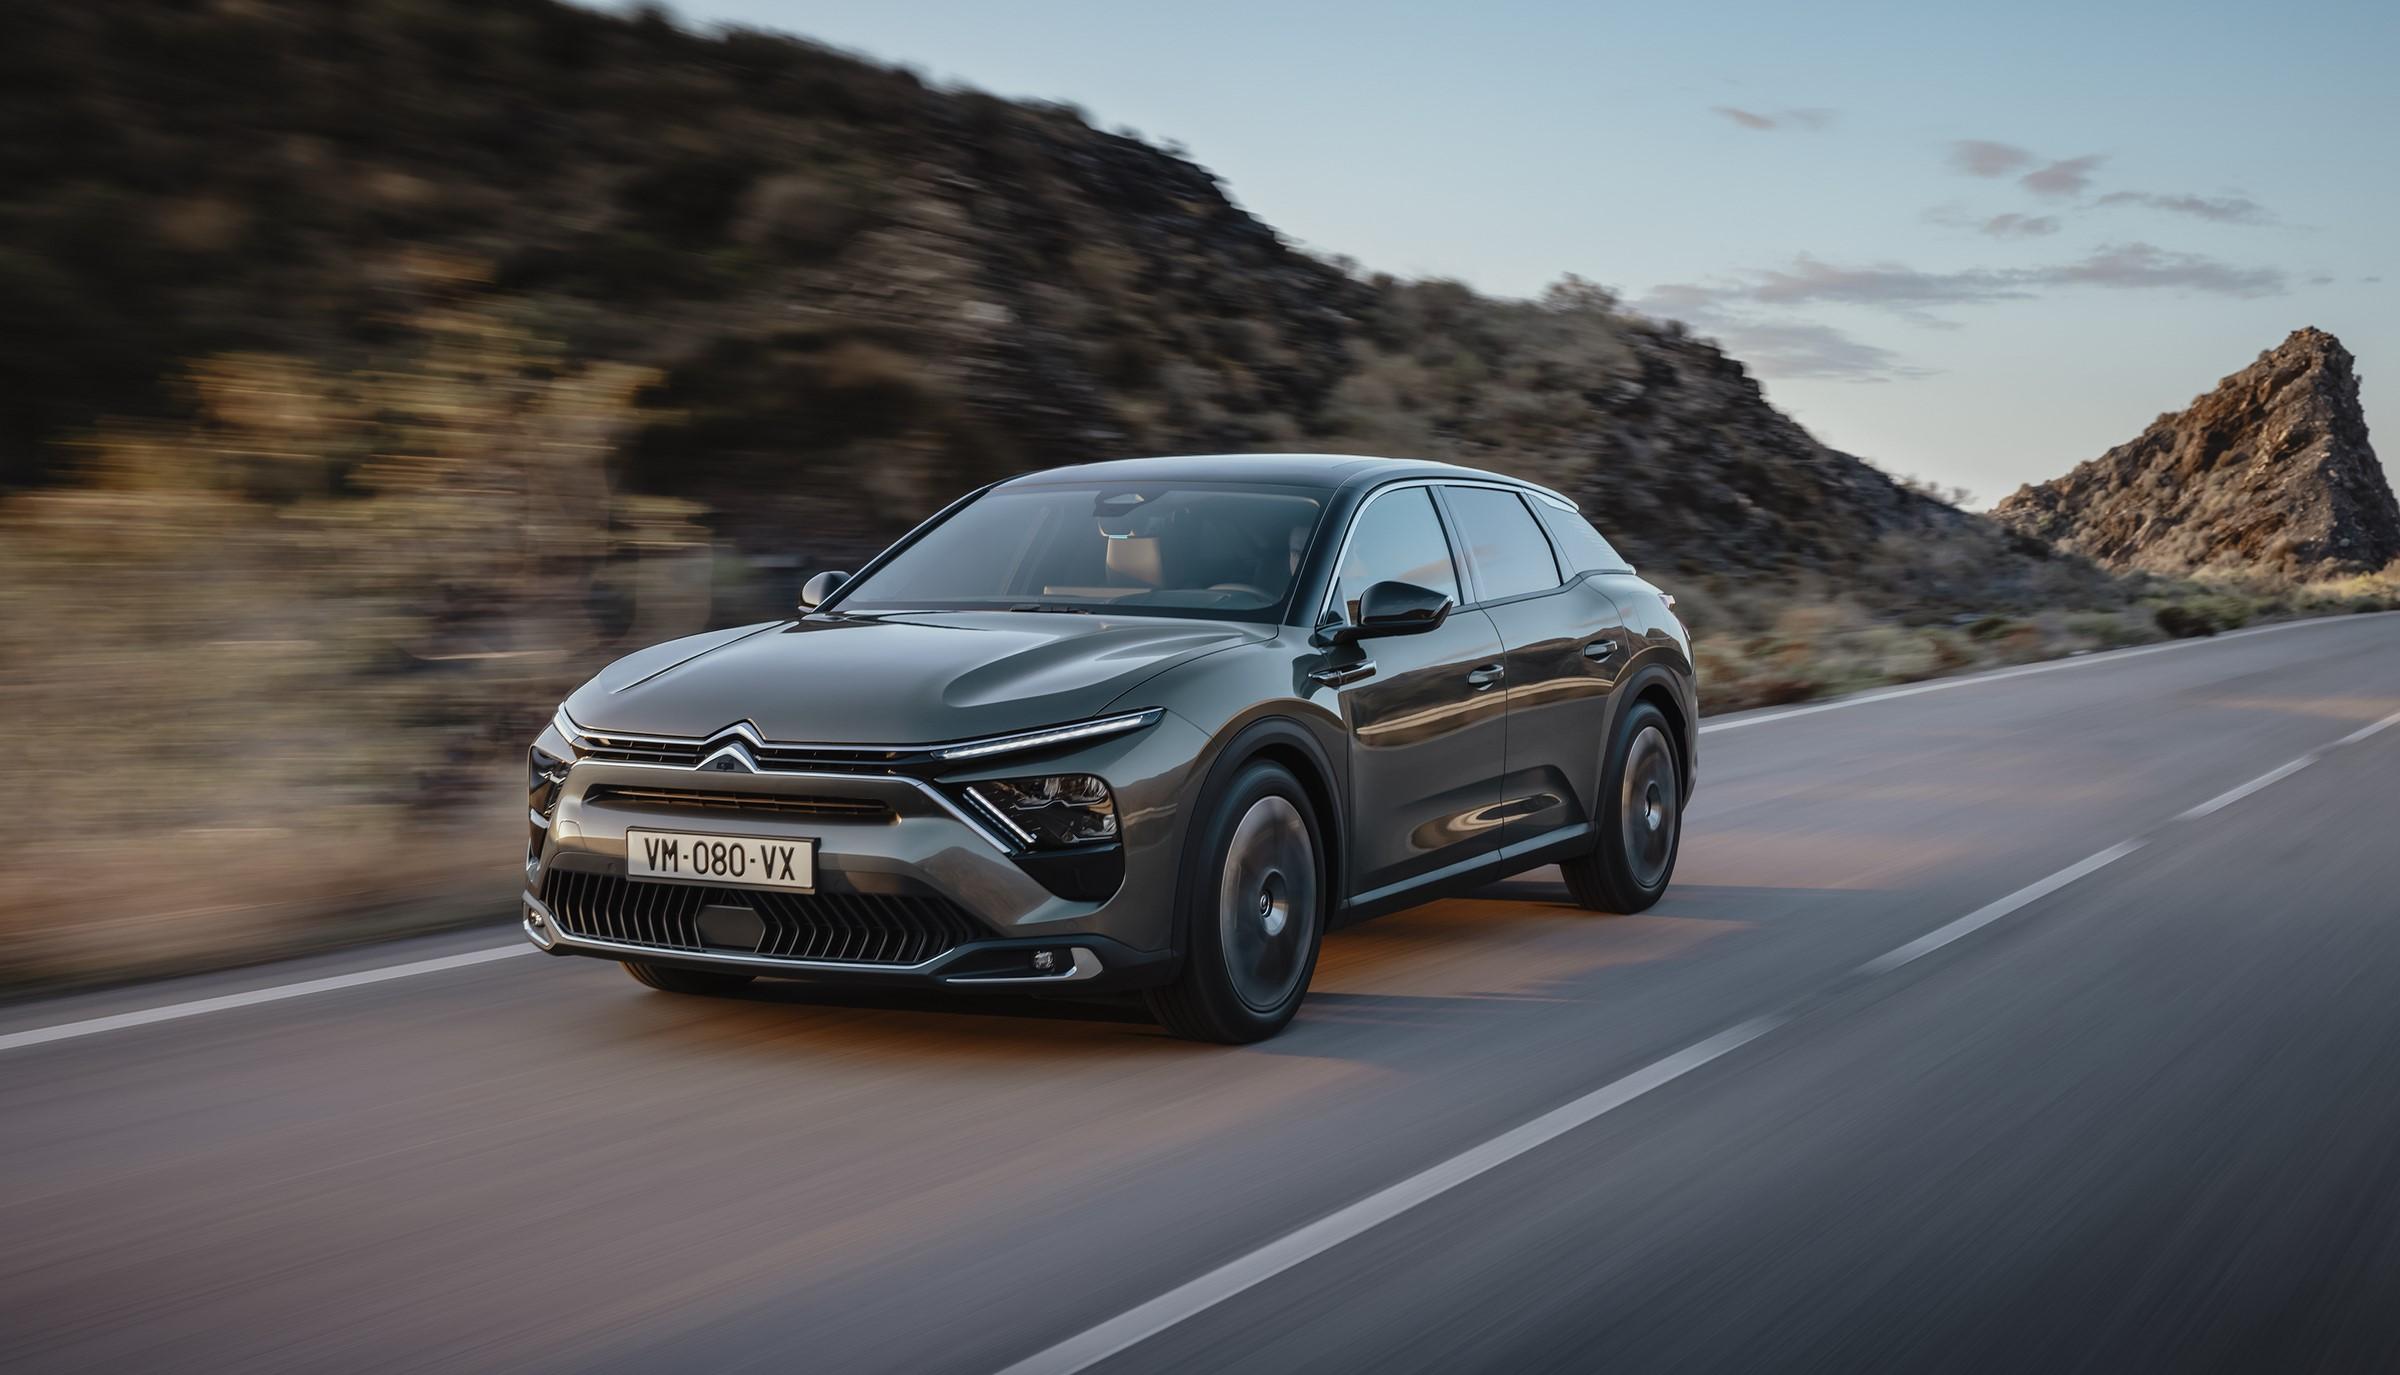 The new Citroën is a mixture of an SUV, wagon and sedan - GARAGEM 360